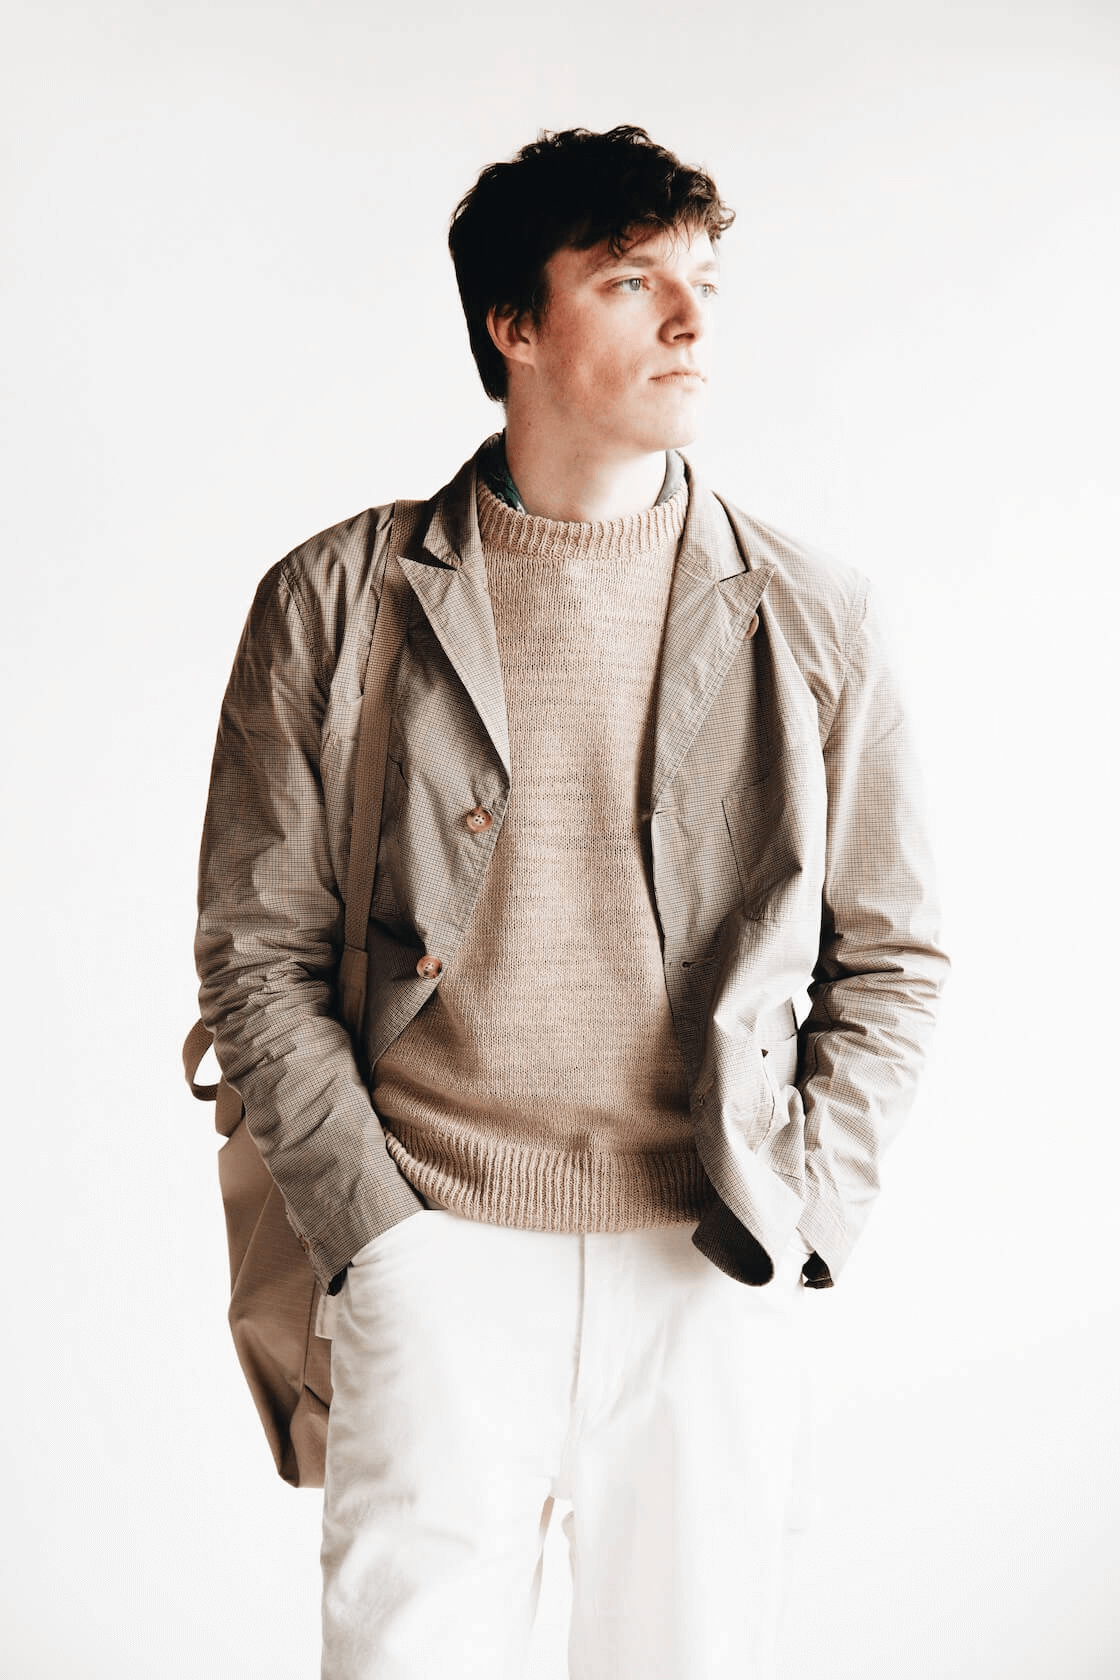 engineered garments nb new bedford jacket on body